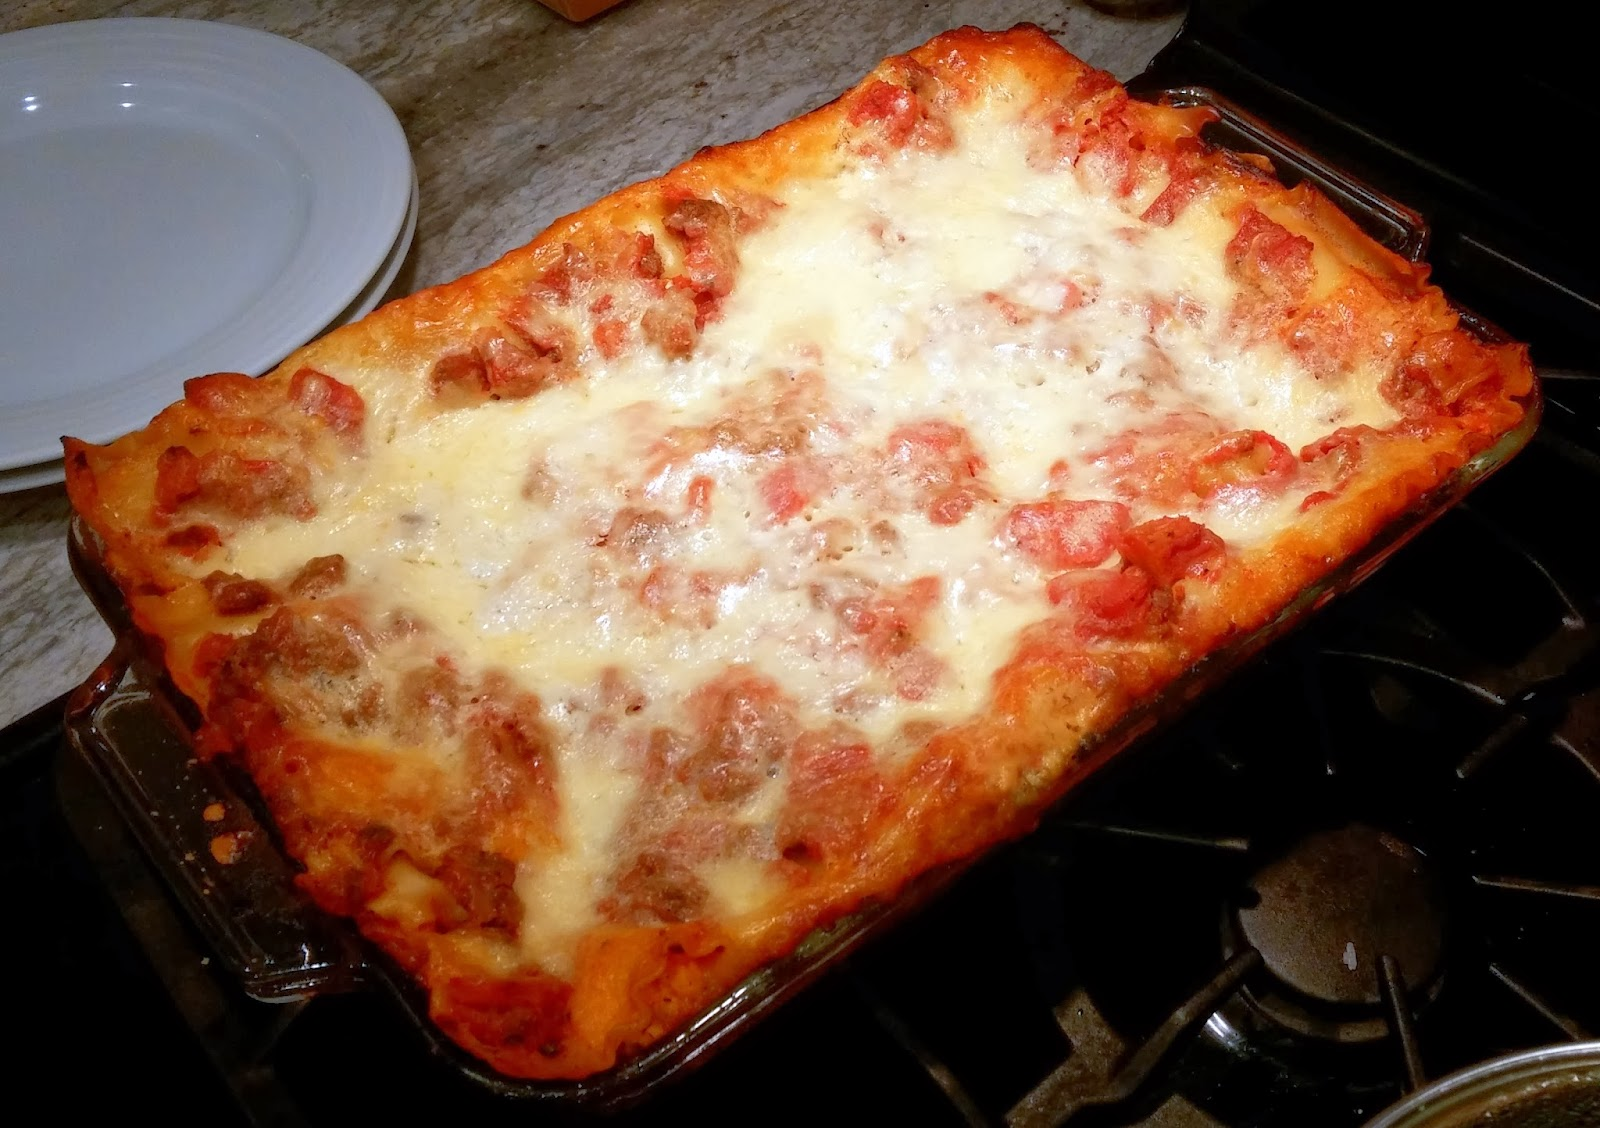 Weeknight lasagna recipe - finished lasagna